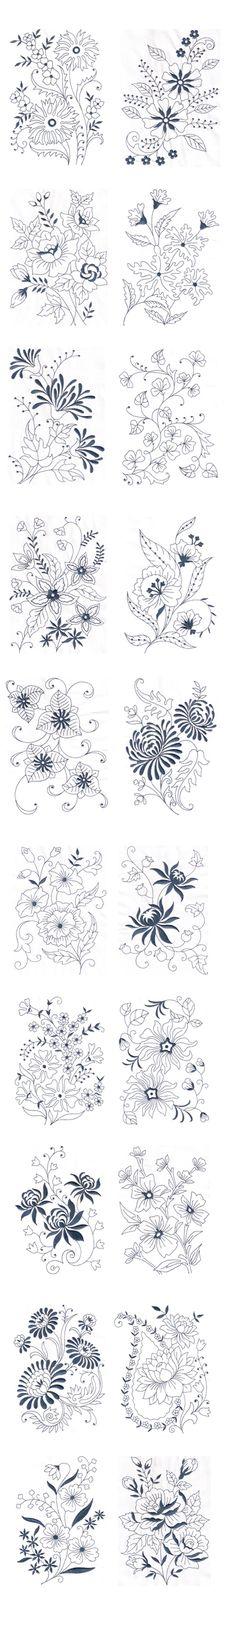 Vintage Floral Design - Machine Embroidery Design on Behance